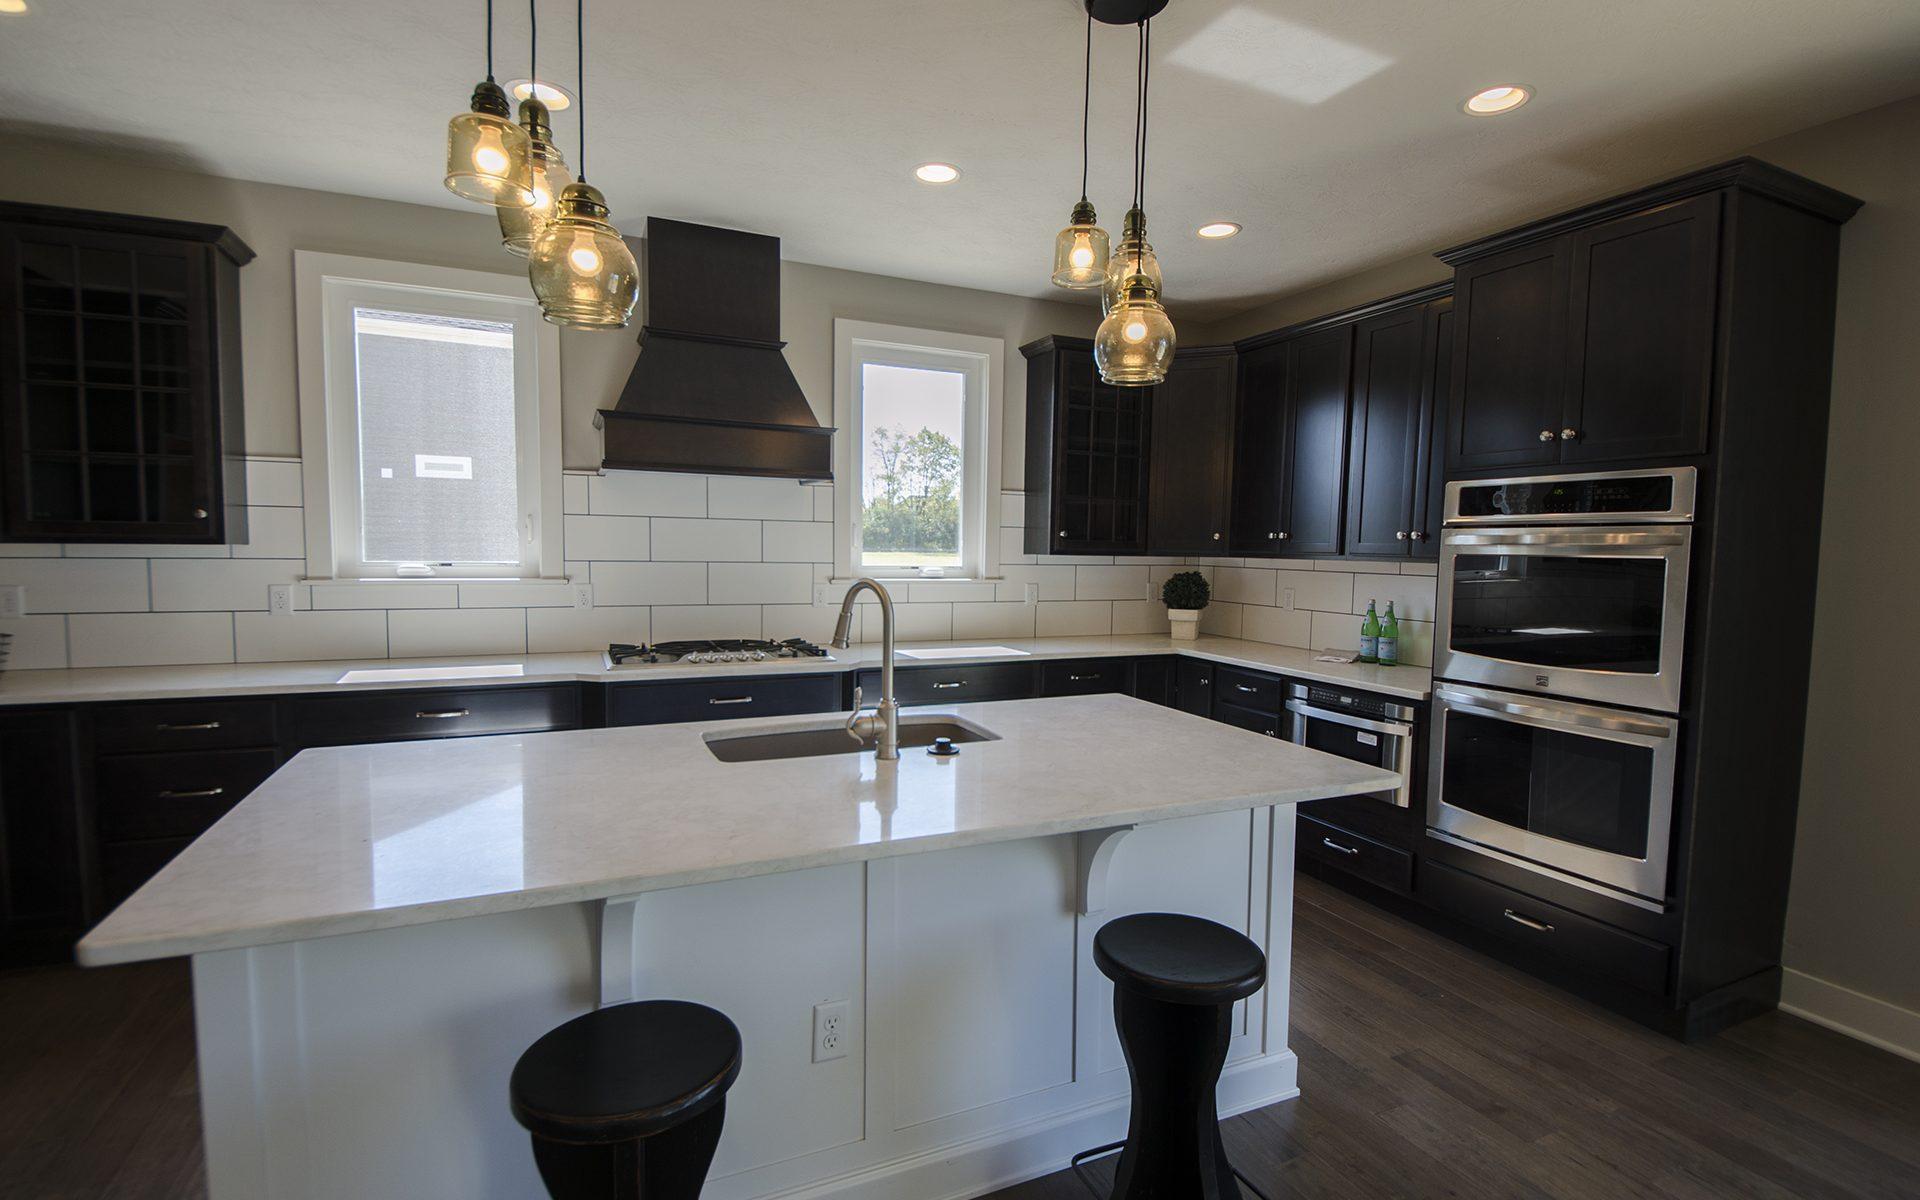 Emejing Classic Design Homes Billings Mt Ideas - Decorating House ...